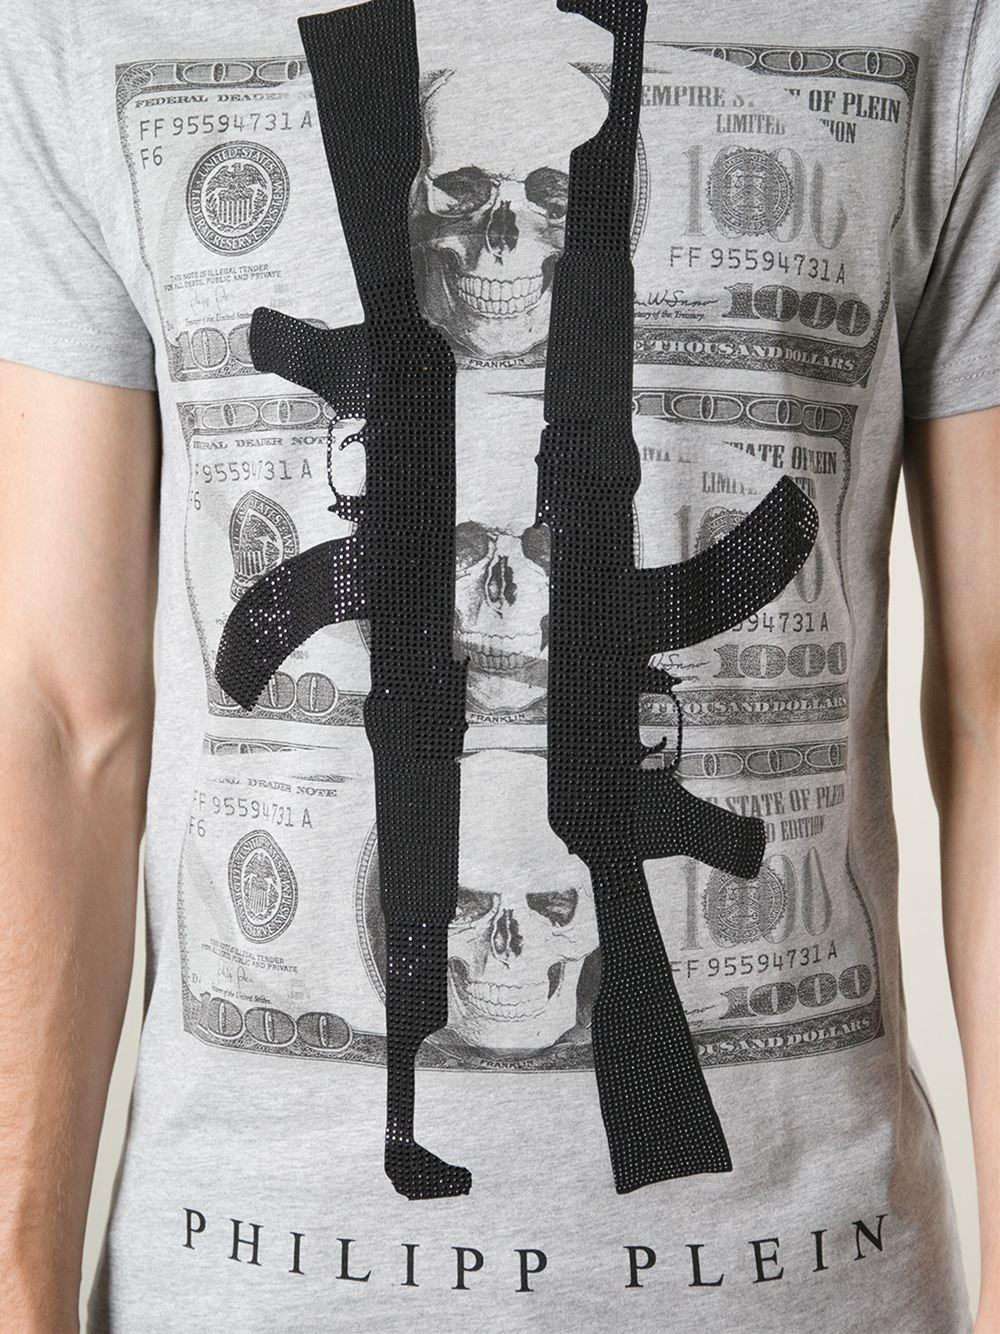 46968b3c0 4 Dollar Tee Shirts - DREAMWORKS